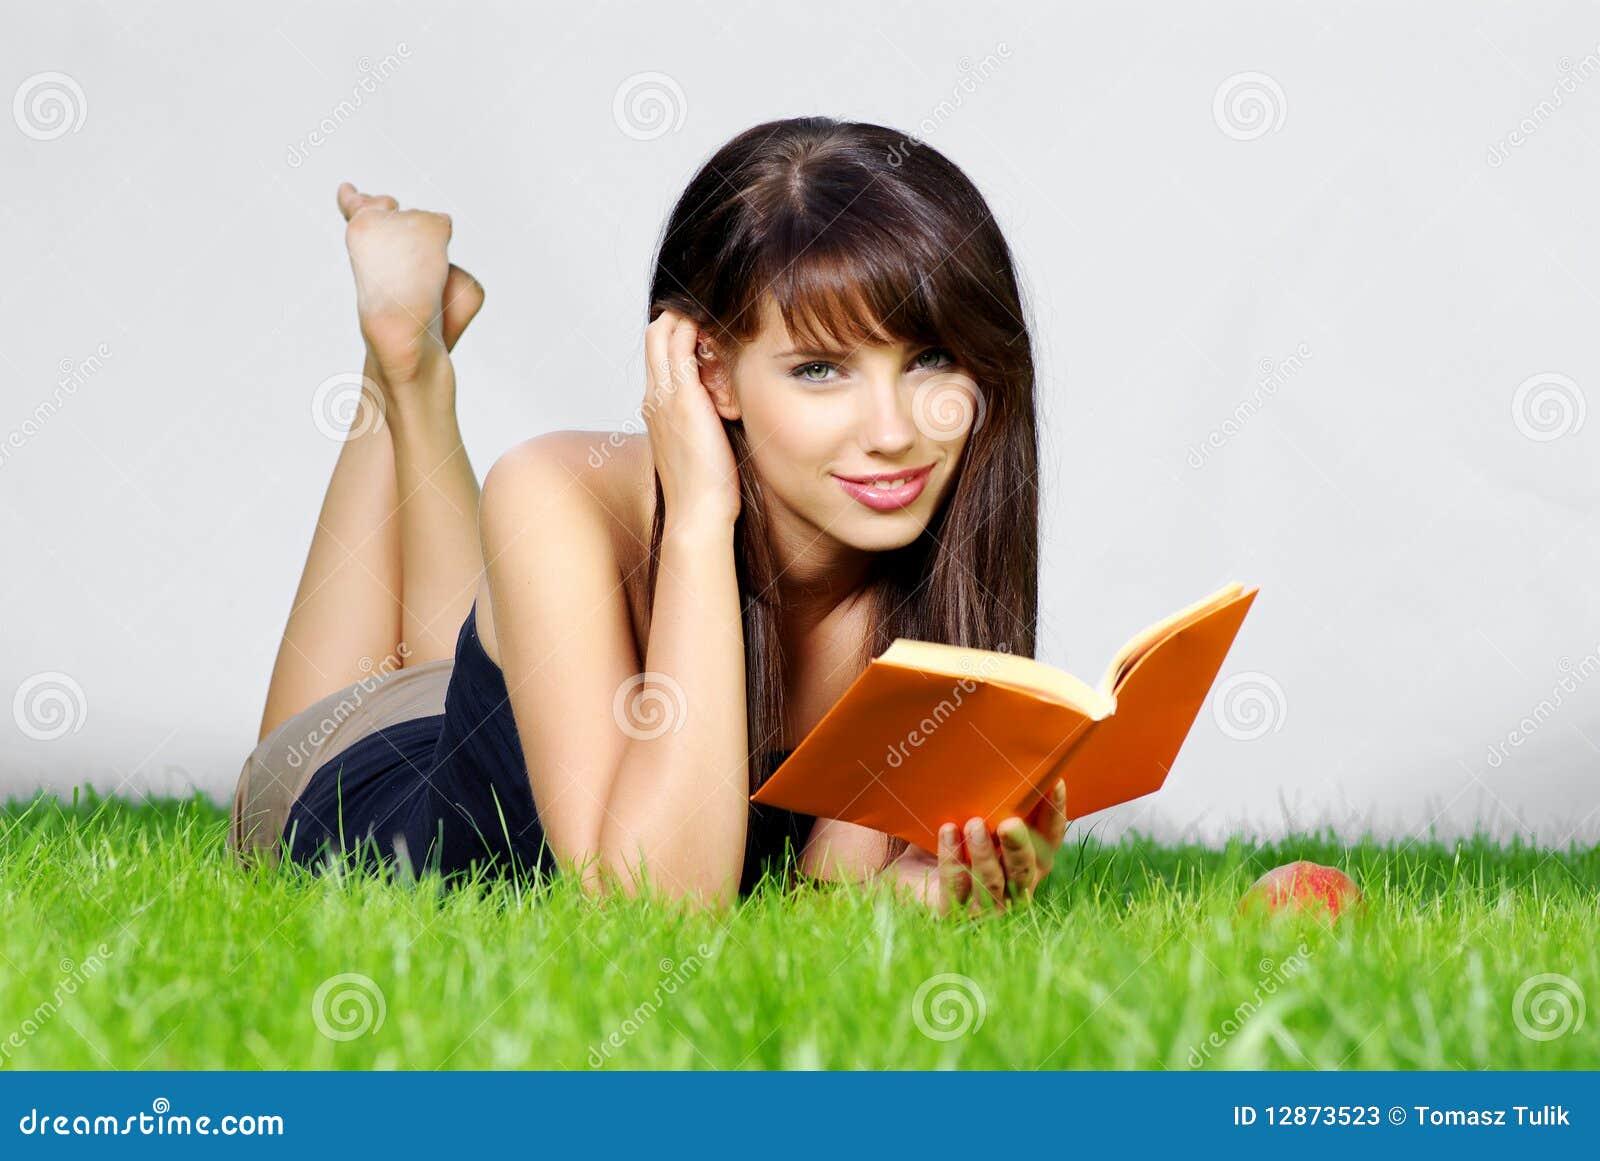 Frau legt auf grünes Feld und liest Buch.